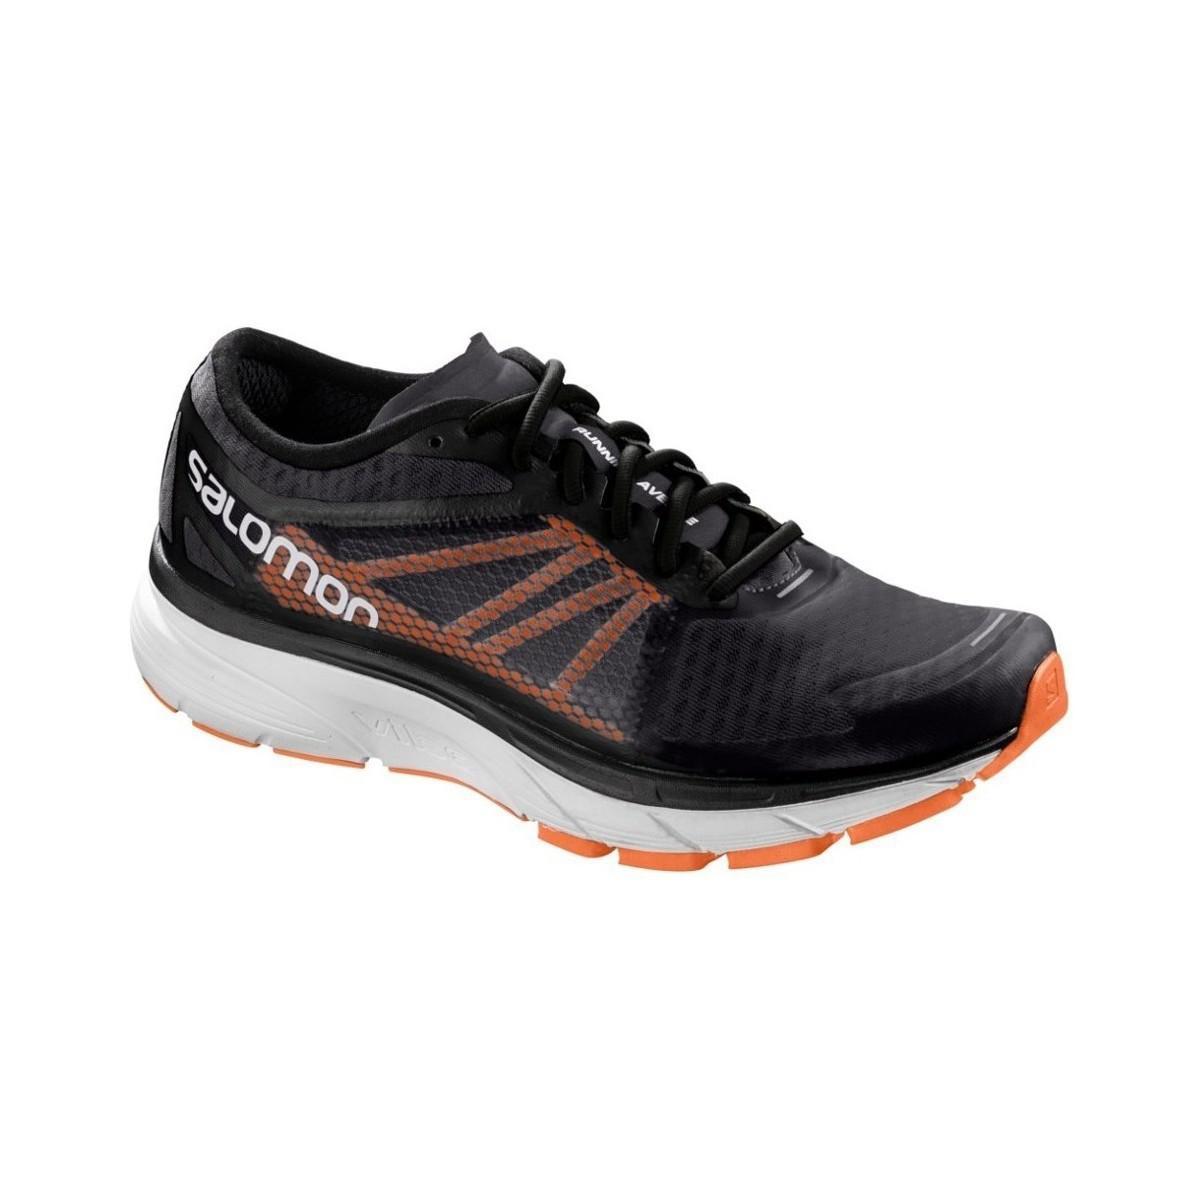 b5fe3fe13682 Yves Salomon Sonic Ra M Men s Shoes (trainers) In Black in Black for ...